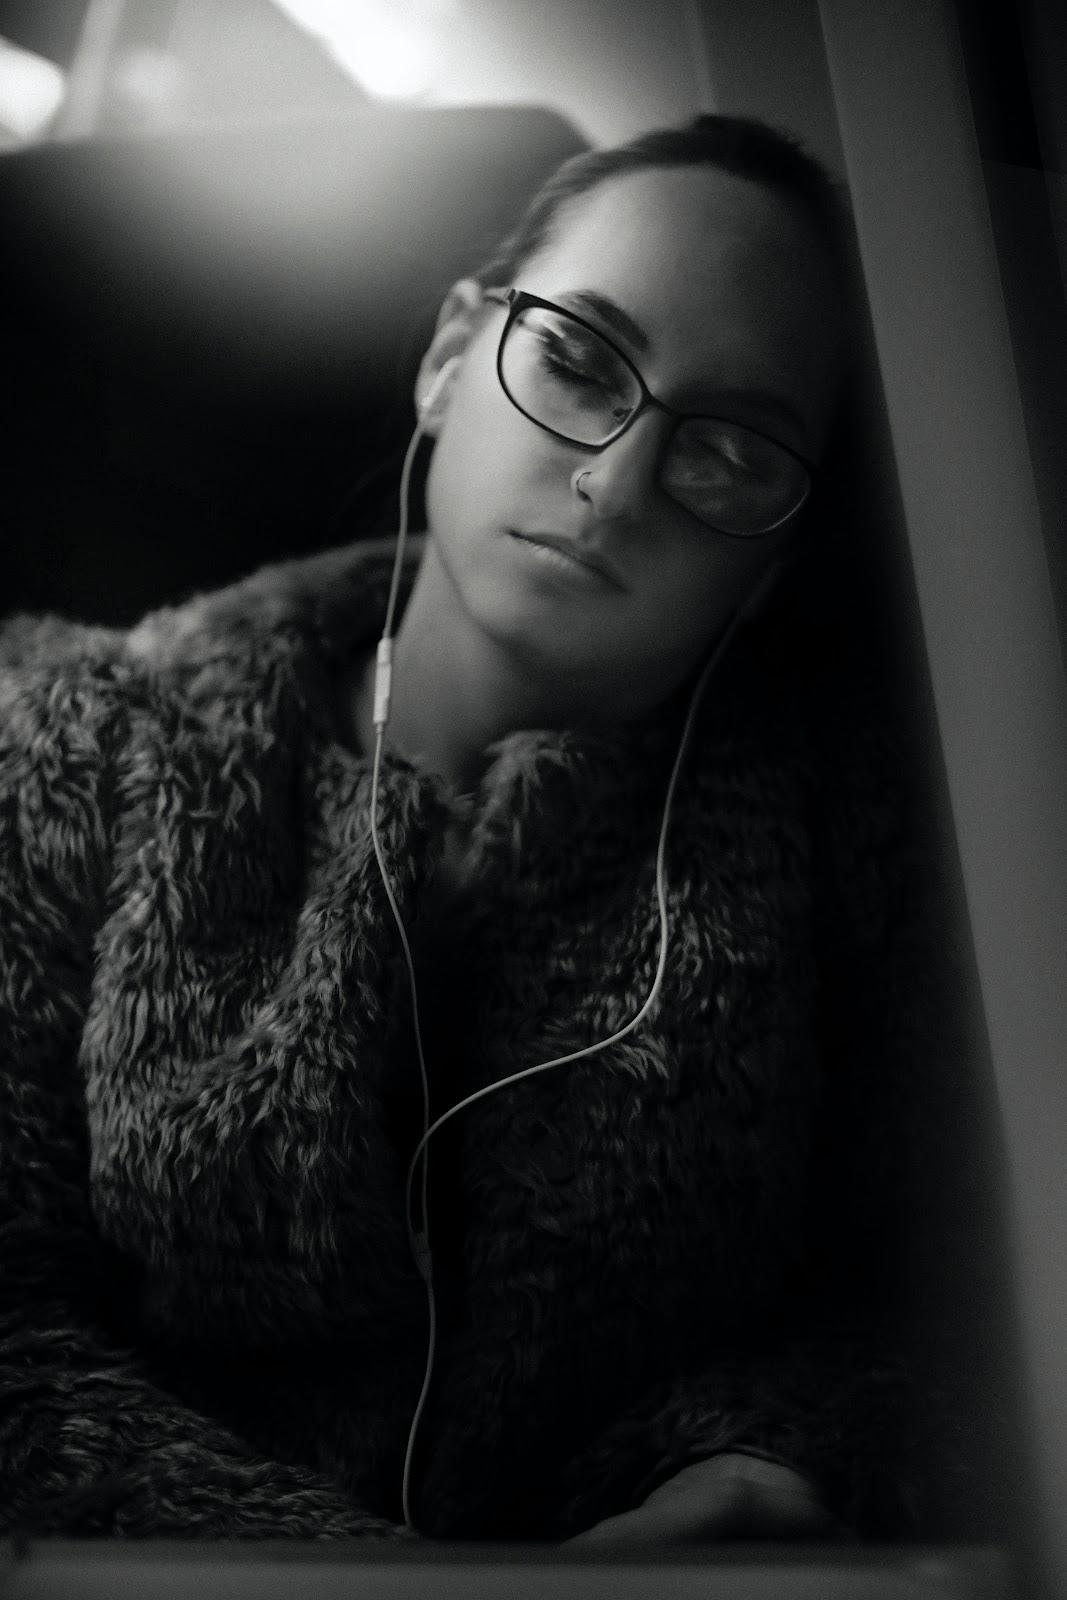 Deep sleep music for insomnia